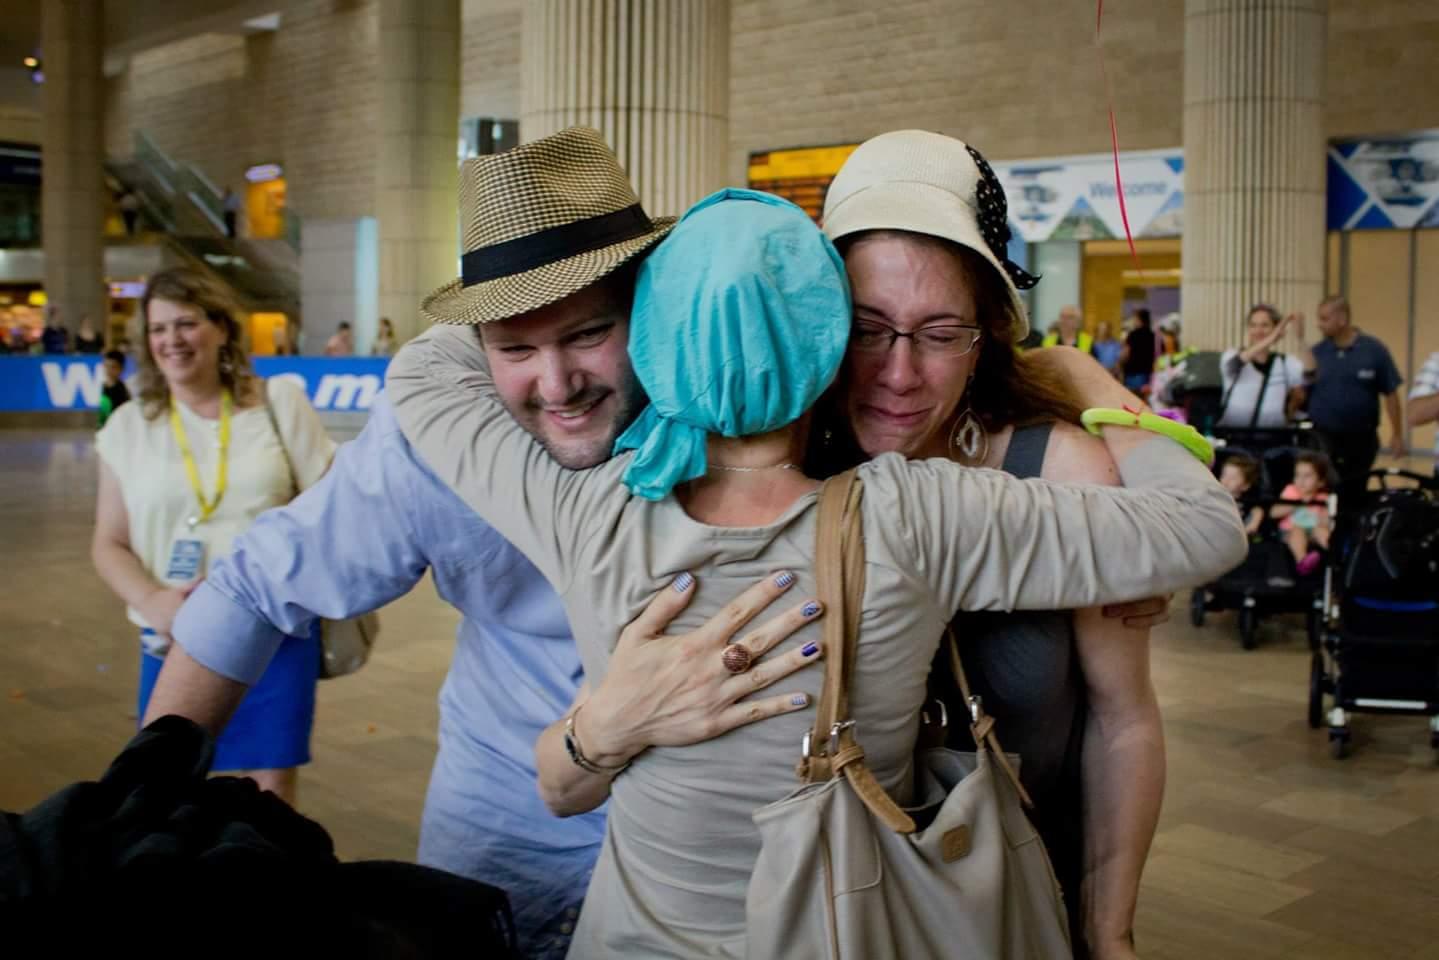 Aliyah: Four Years an Israeli